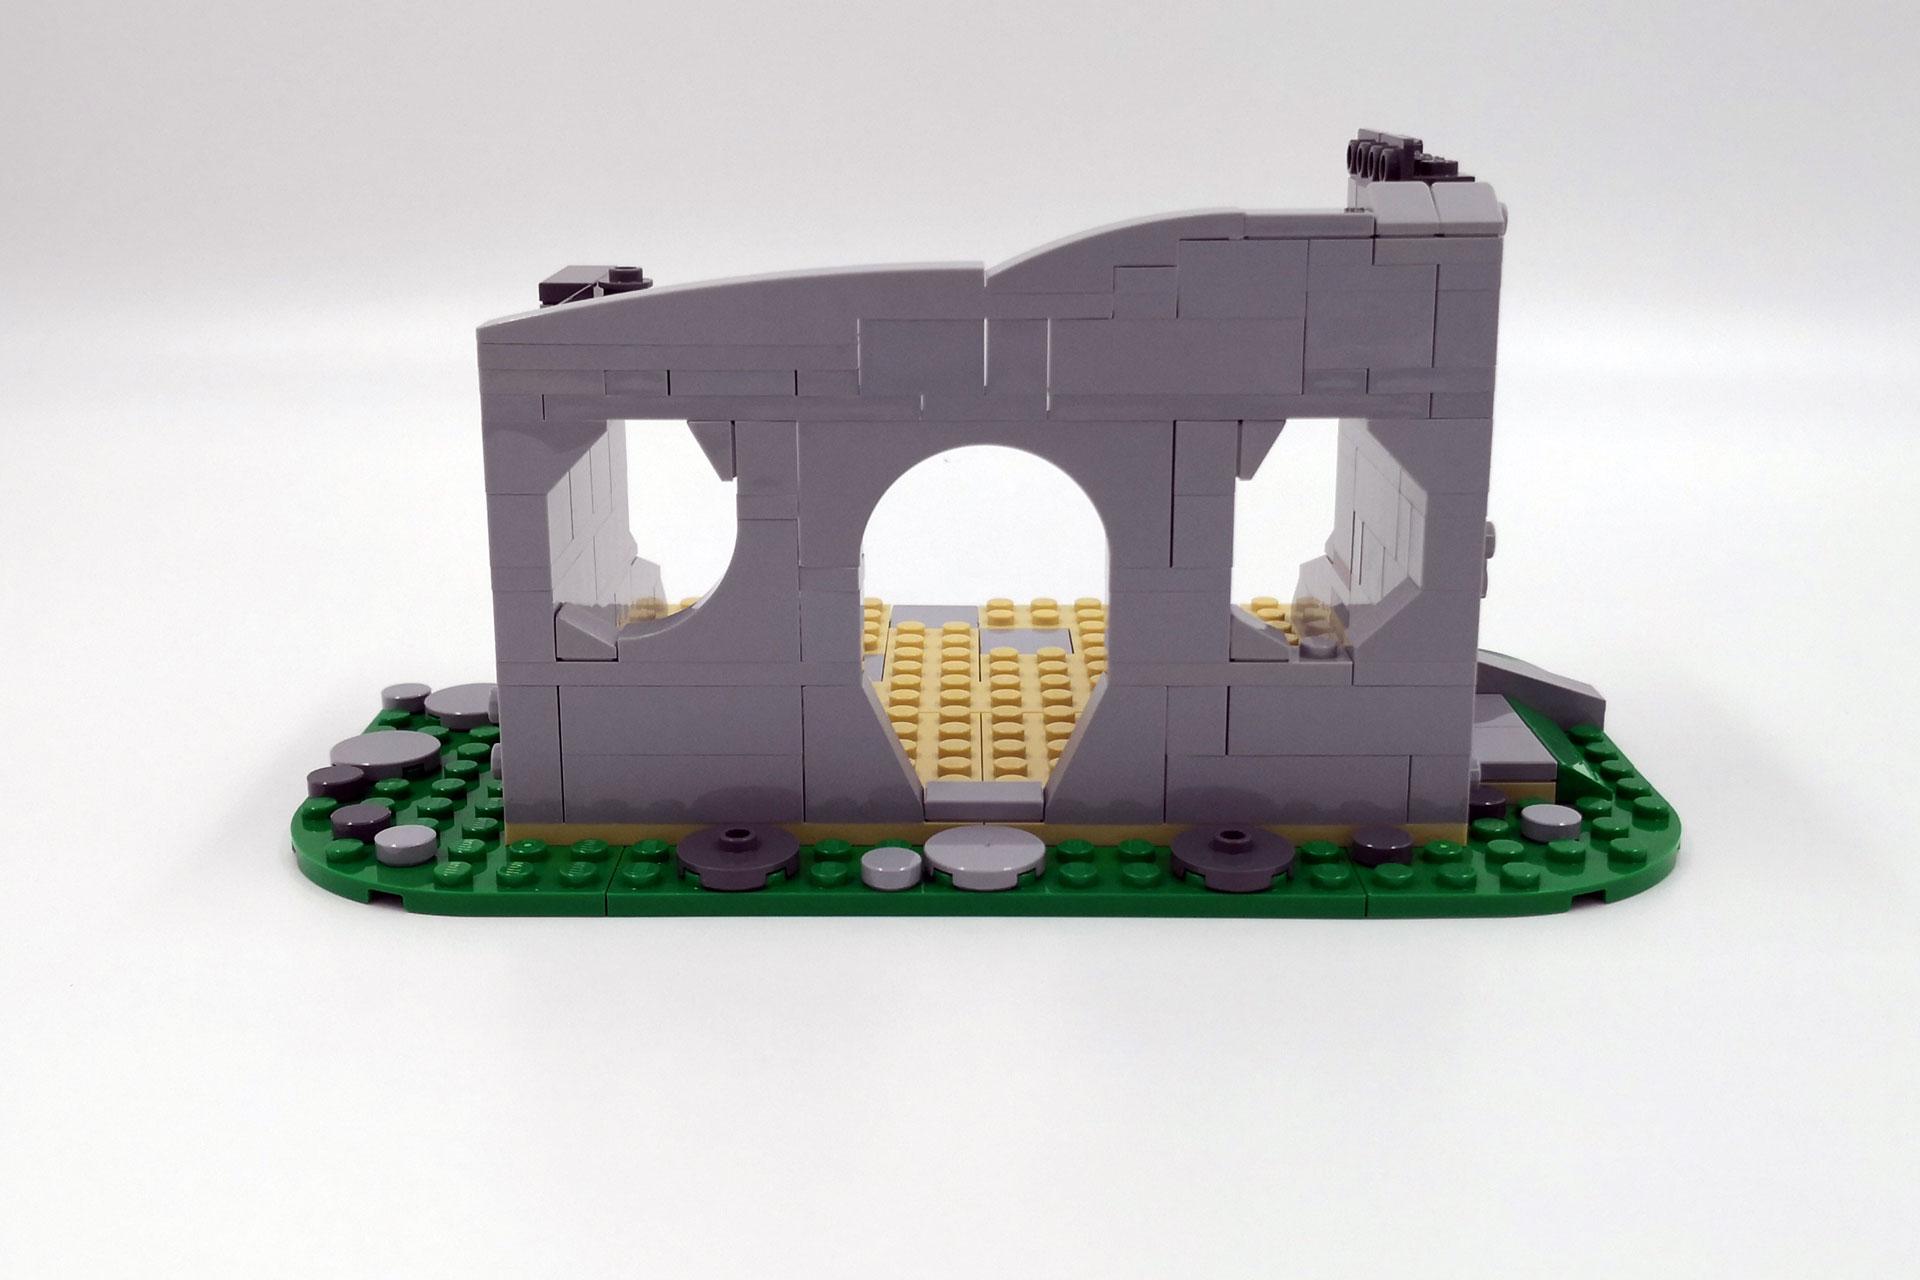 LEGO 21316 The Flintstones - Rohbau